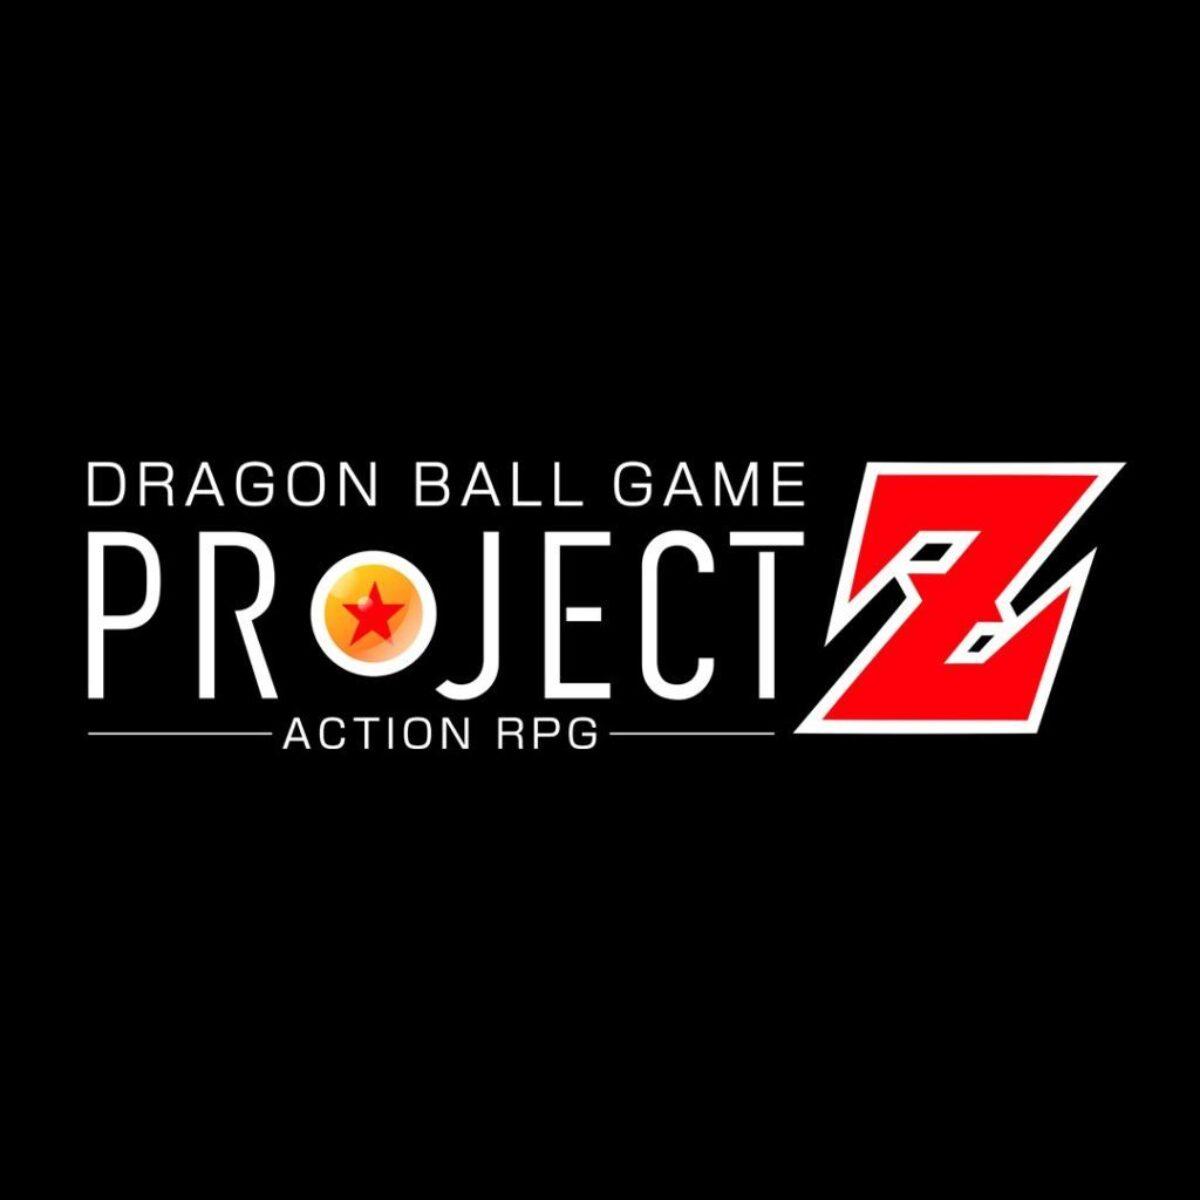 Logo Dragon Ball Z Game Project